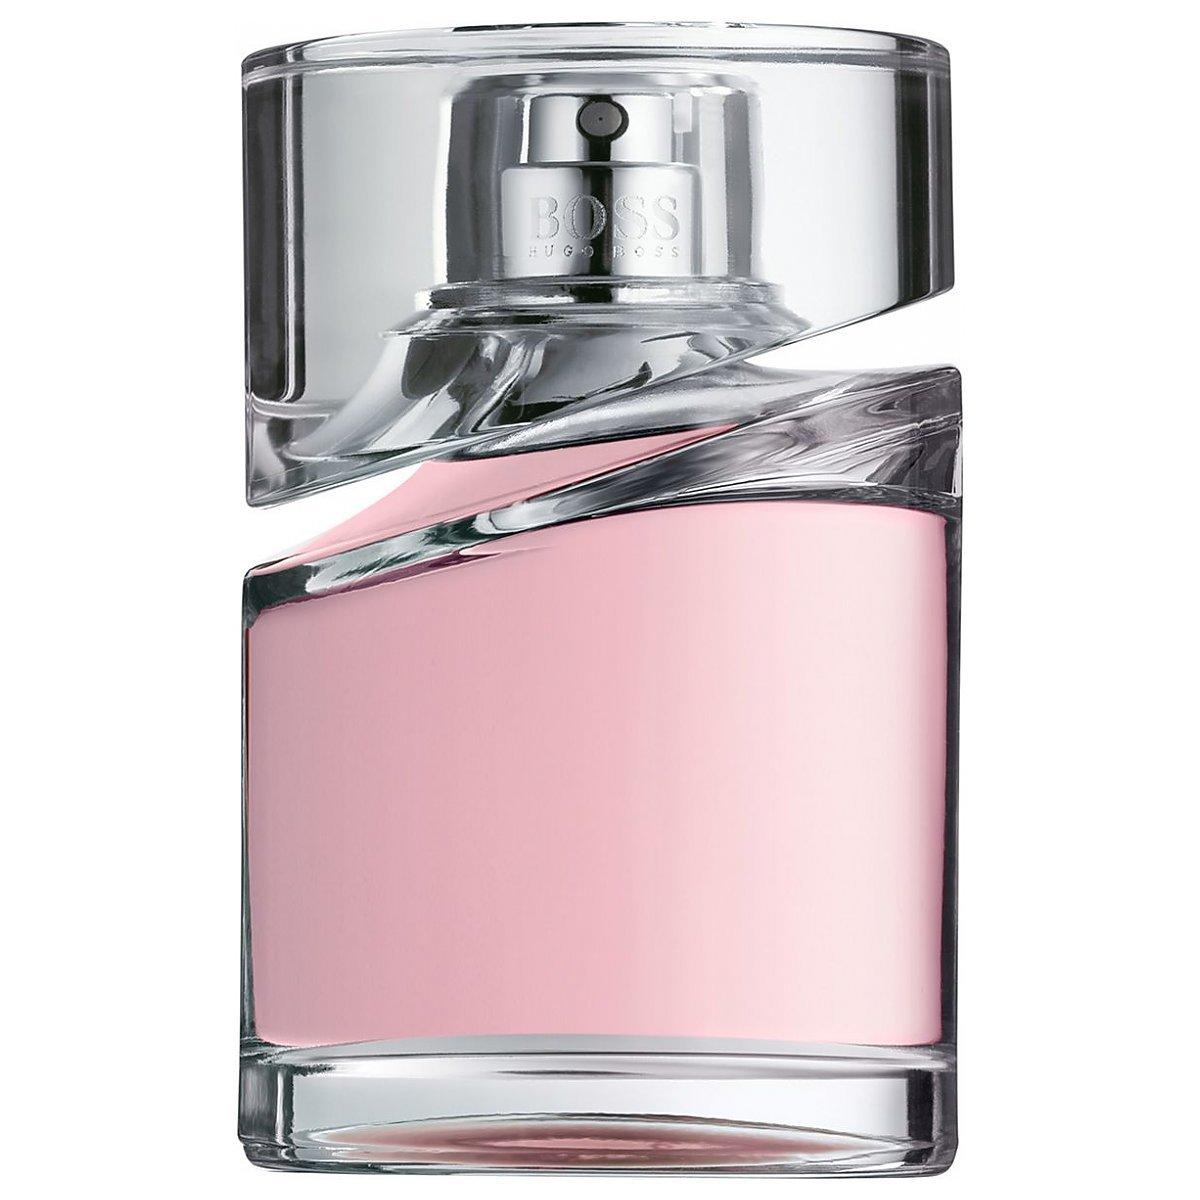 503515951d112 Hugo Boss Femme by BOSS Woda perfumowana spray 75ml - Perfumeria ...